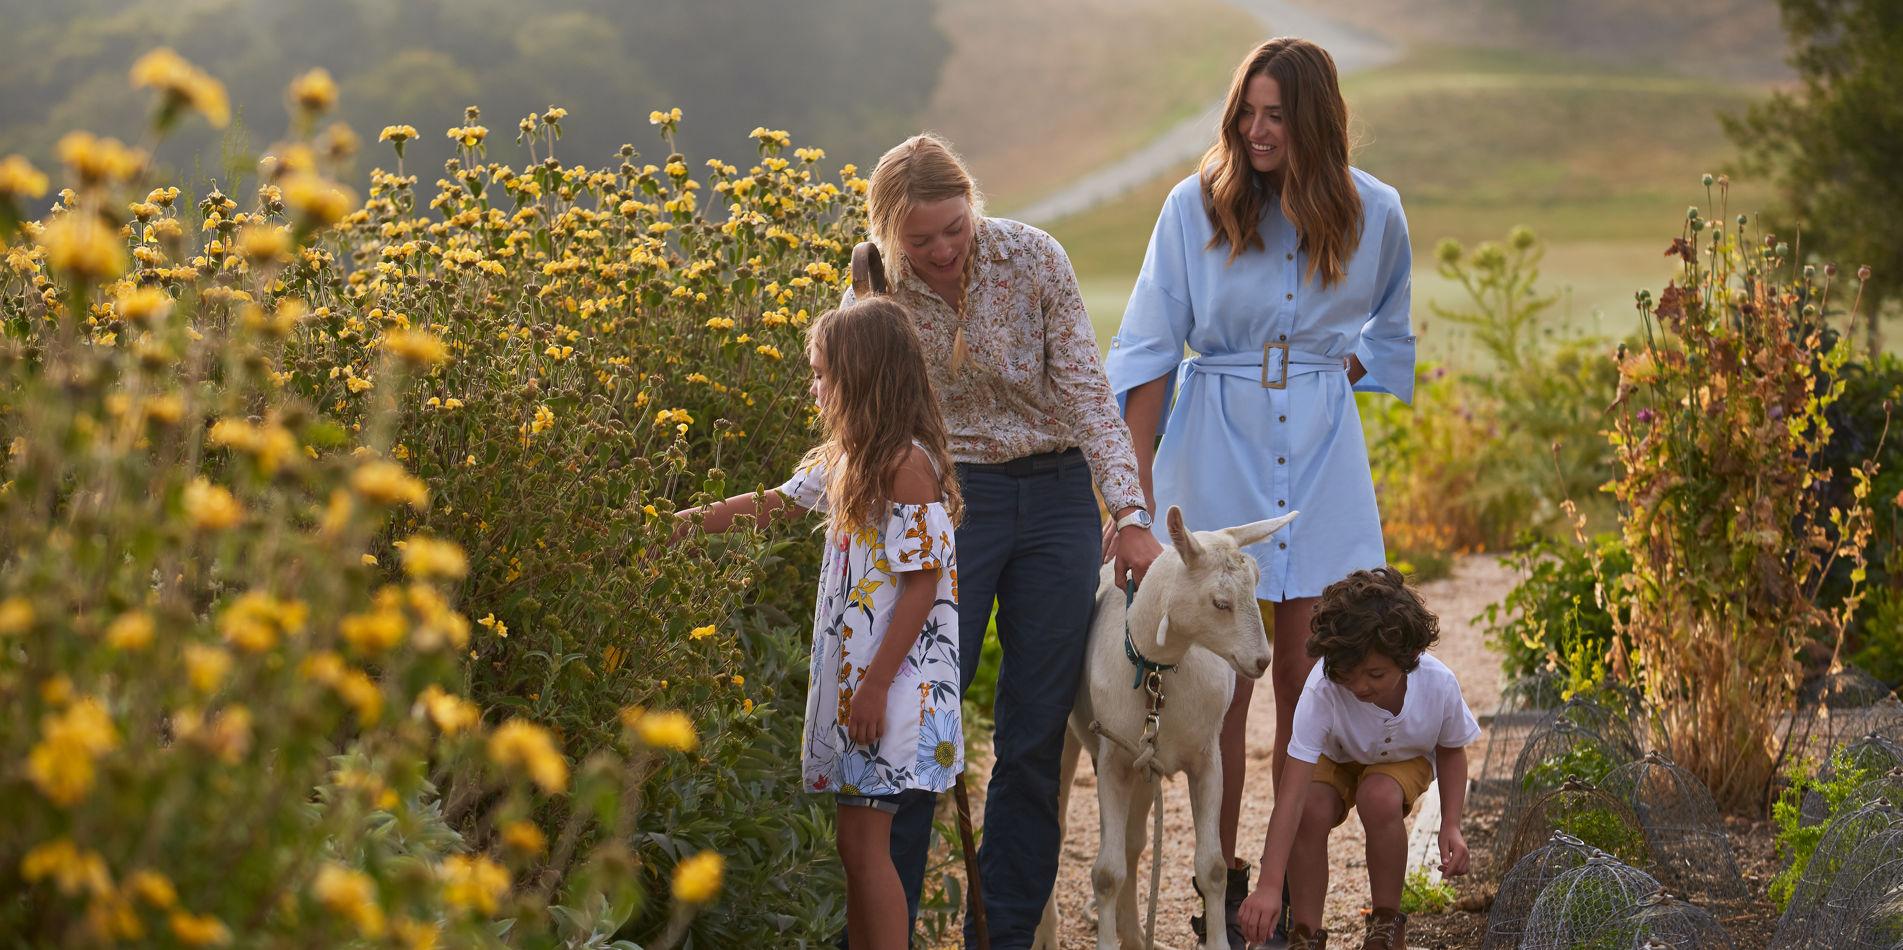 Carmel Valley Ranch_Lifestyle_Organic Garden_Goat Walk_GJ_1234 2_v1_current